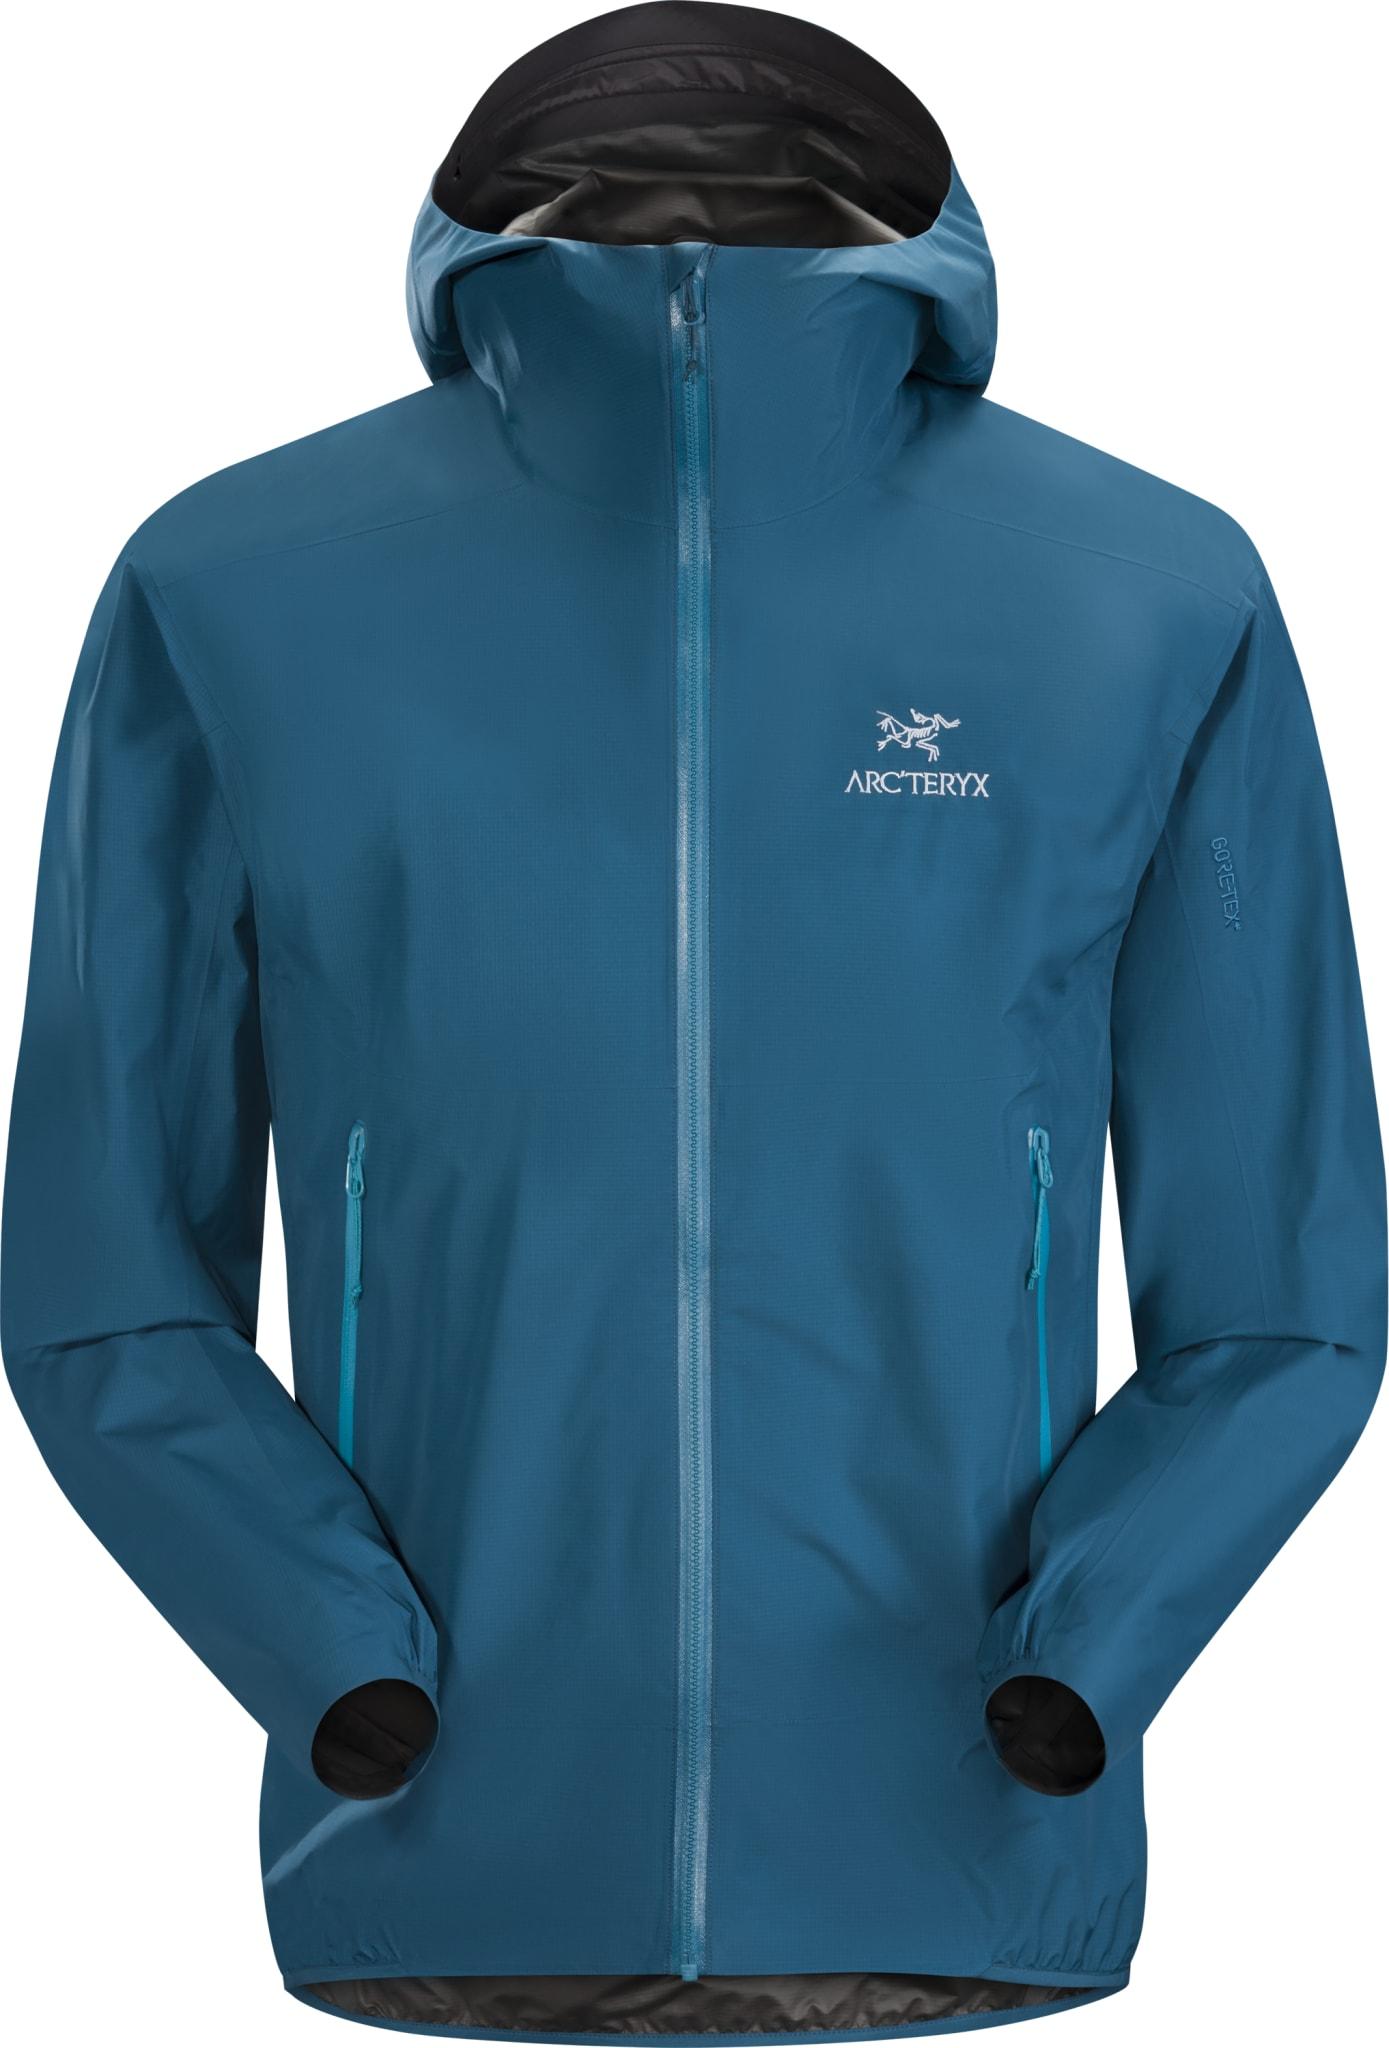 Zeta FL Jacket Ms